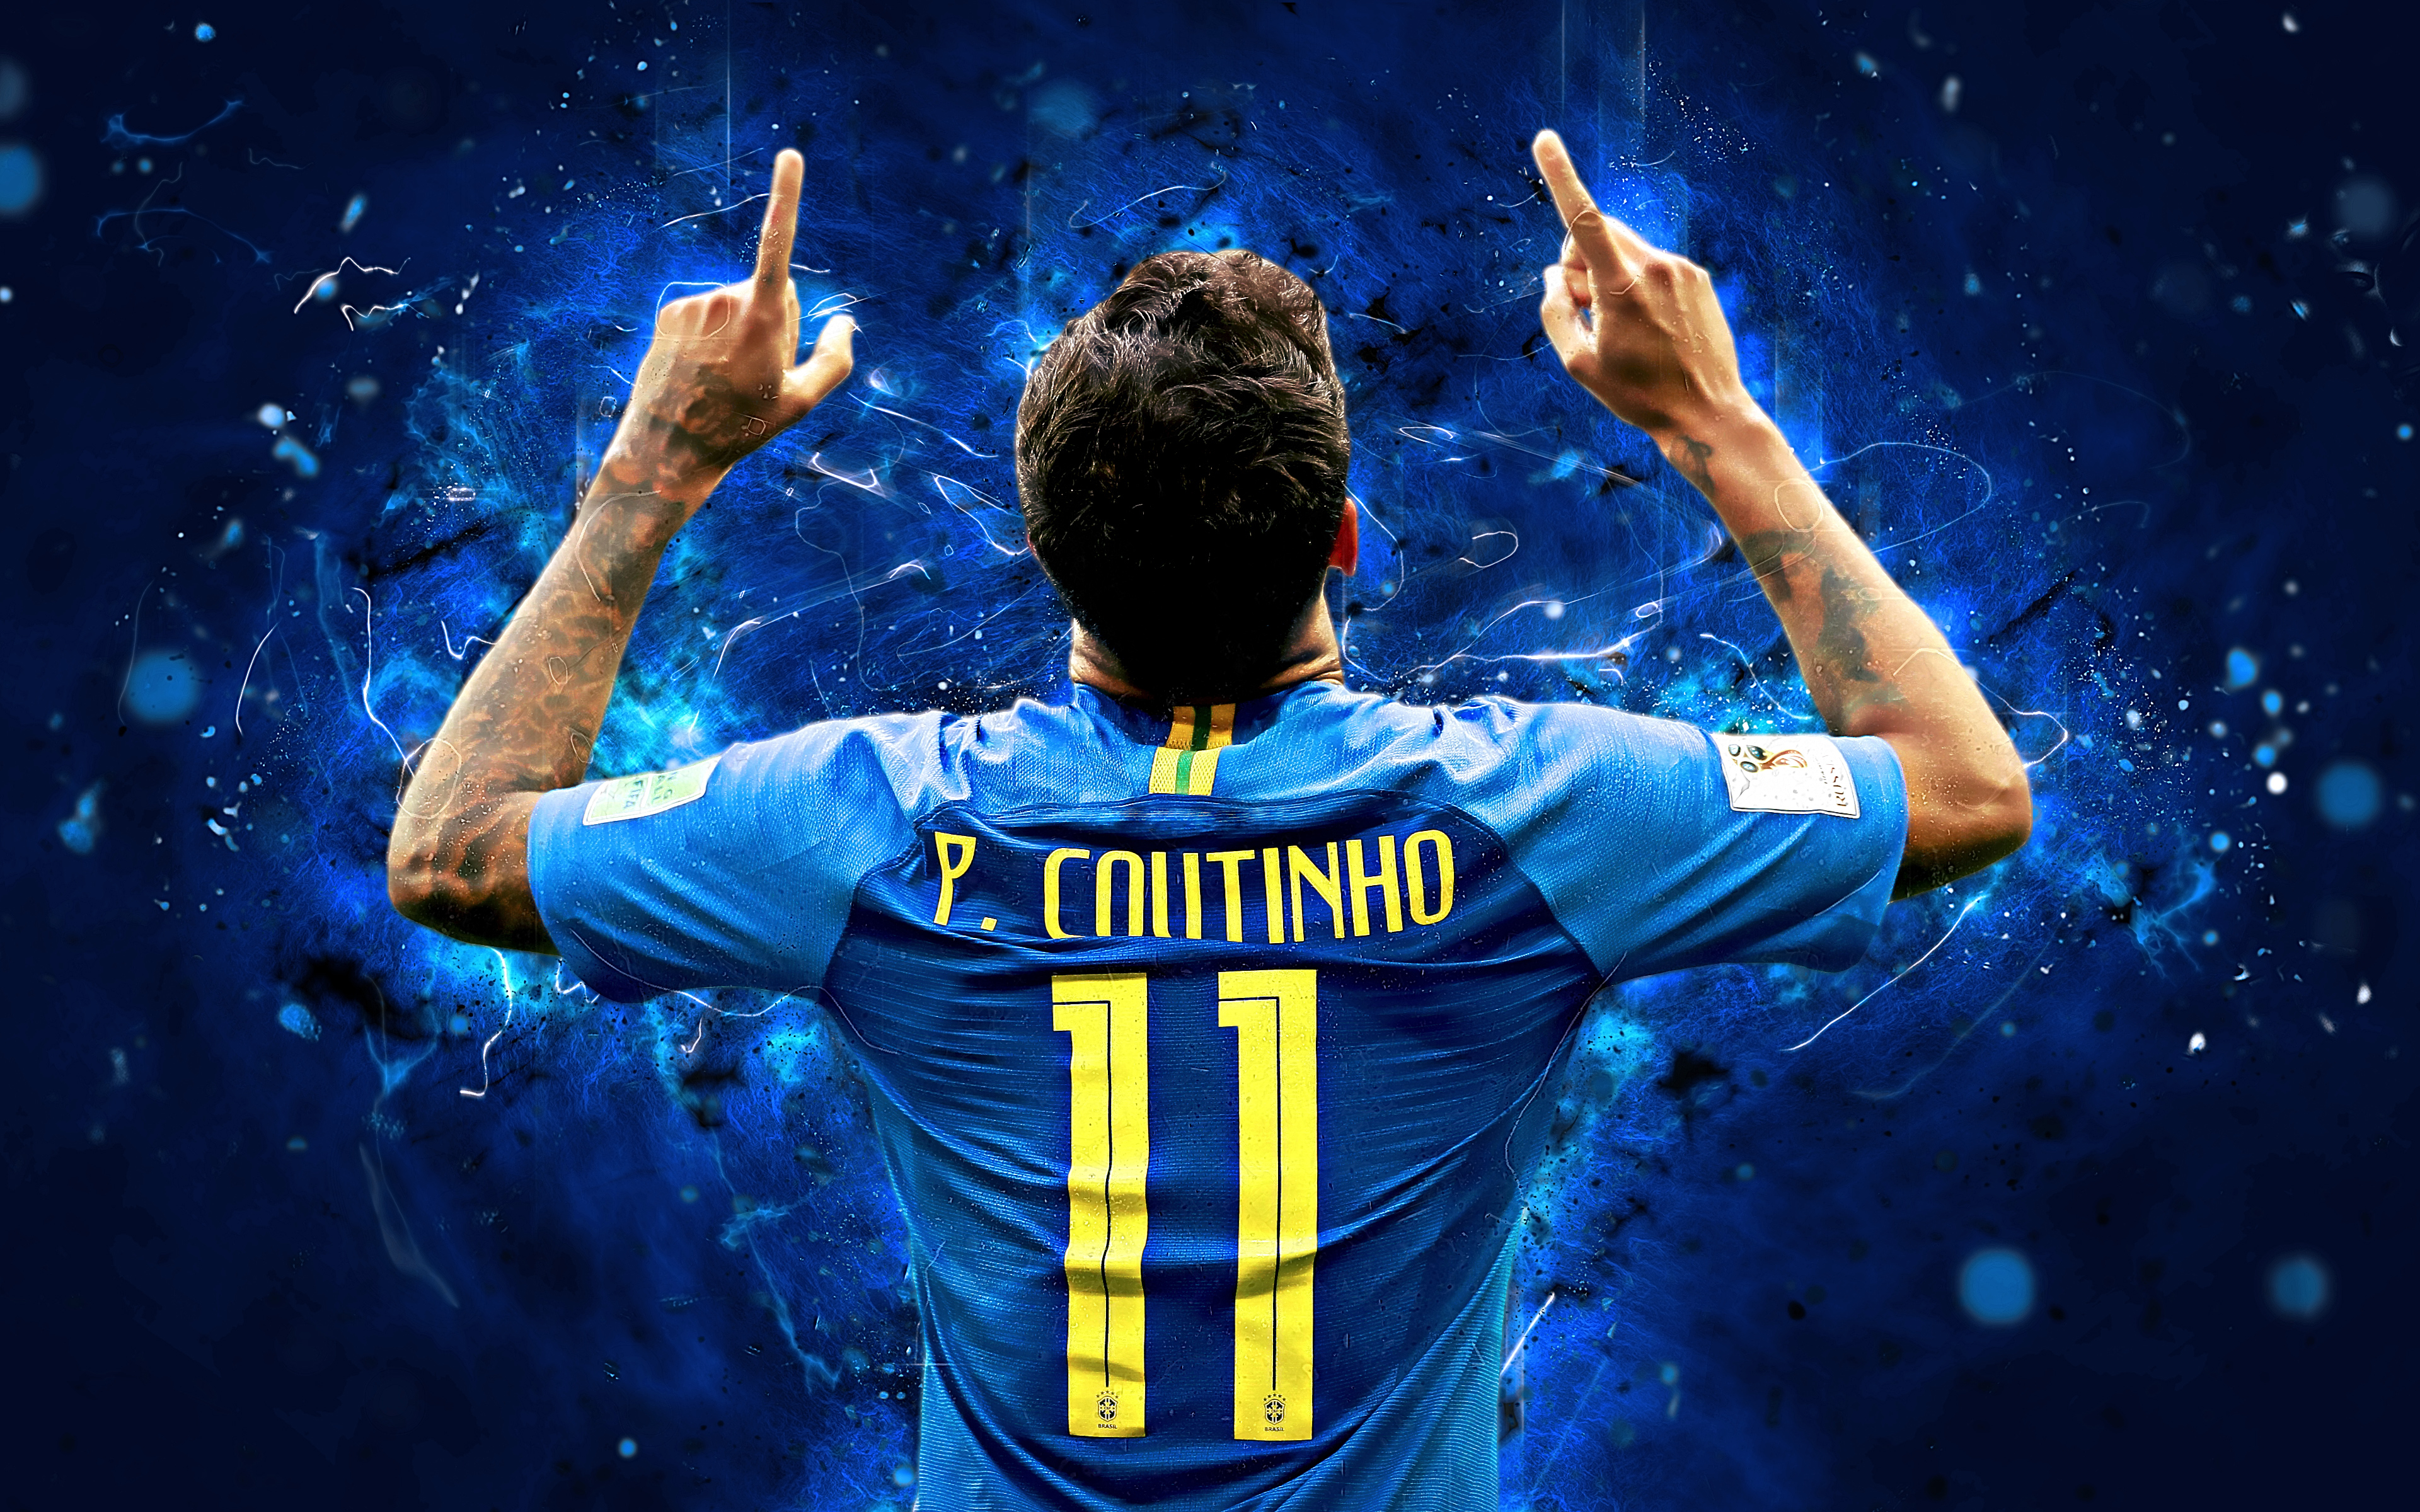 Philippe coutinho brasil 4k ultra hd wallpaper - Coutinho wallpaper hd ...